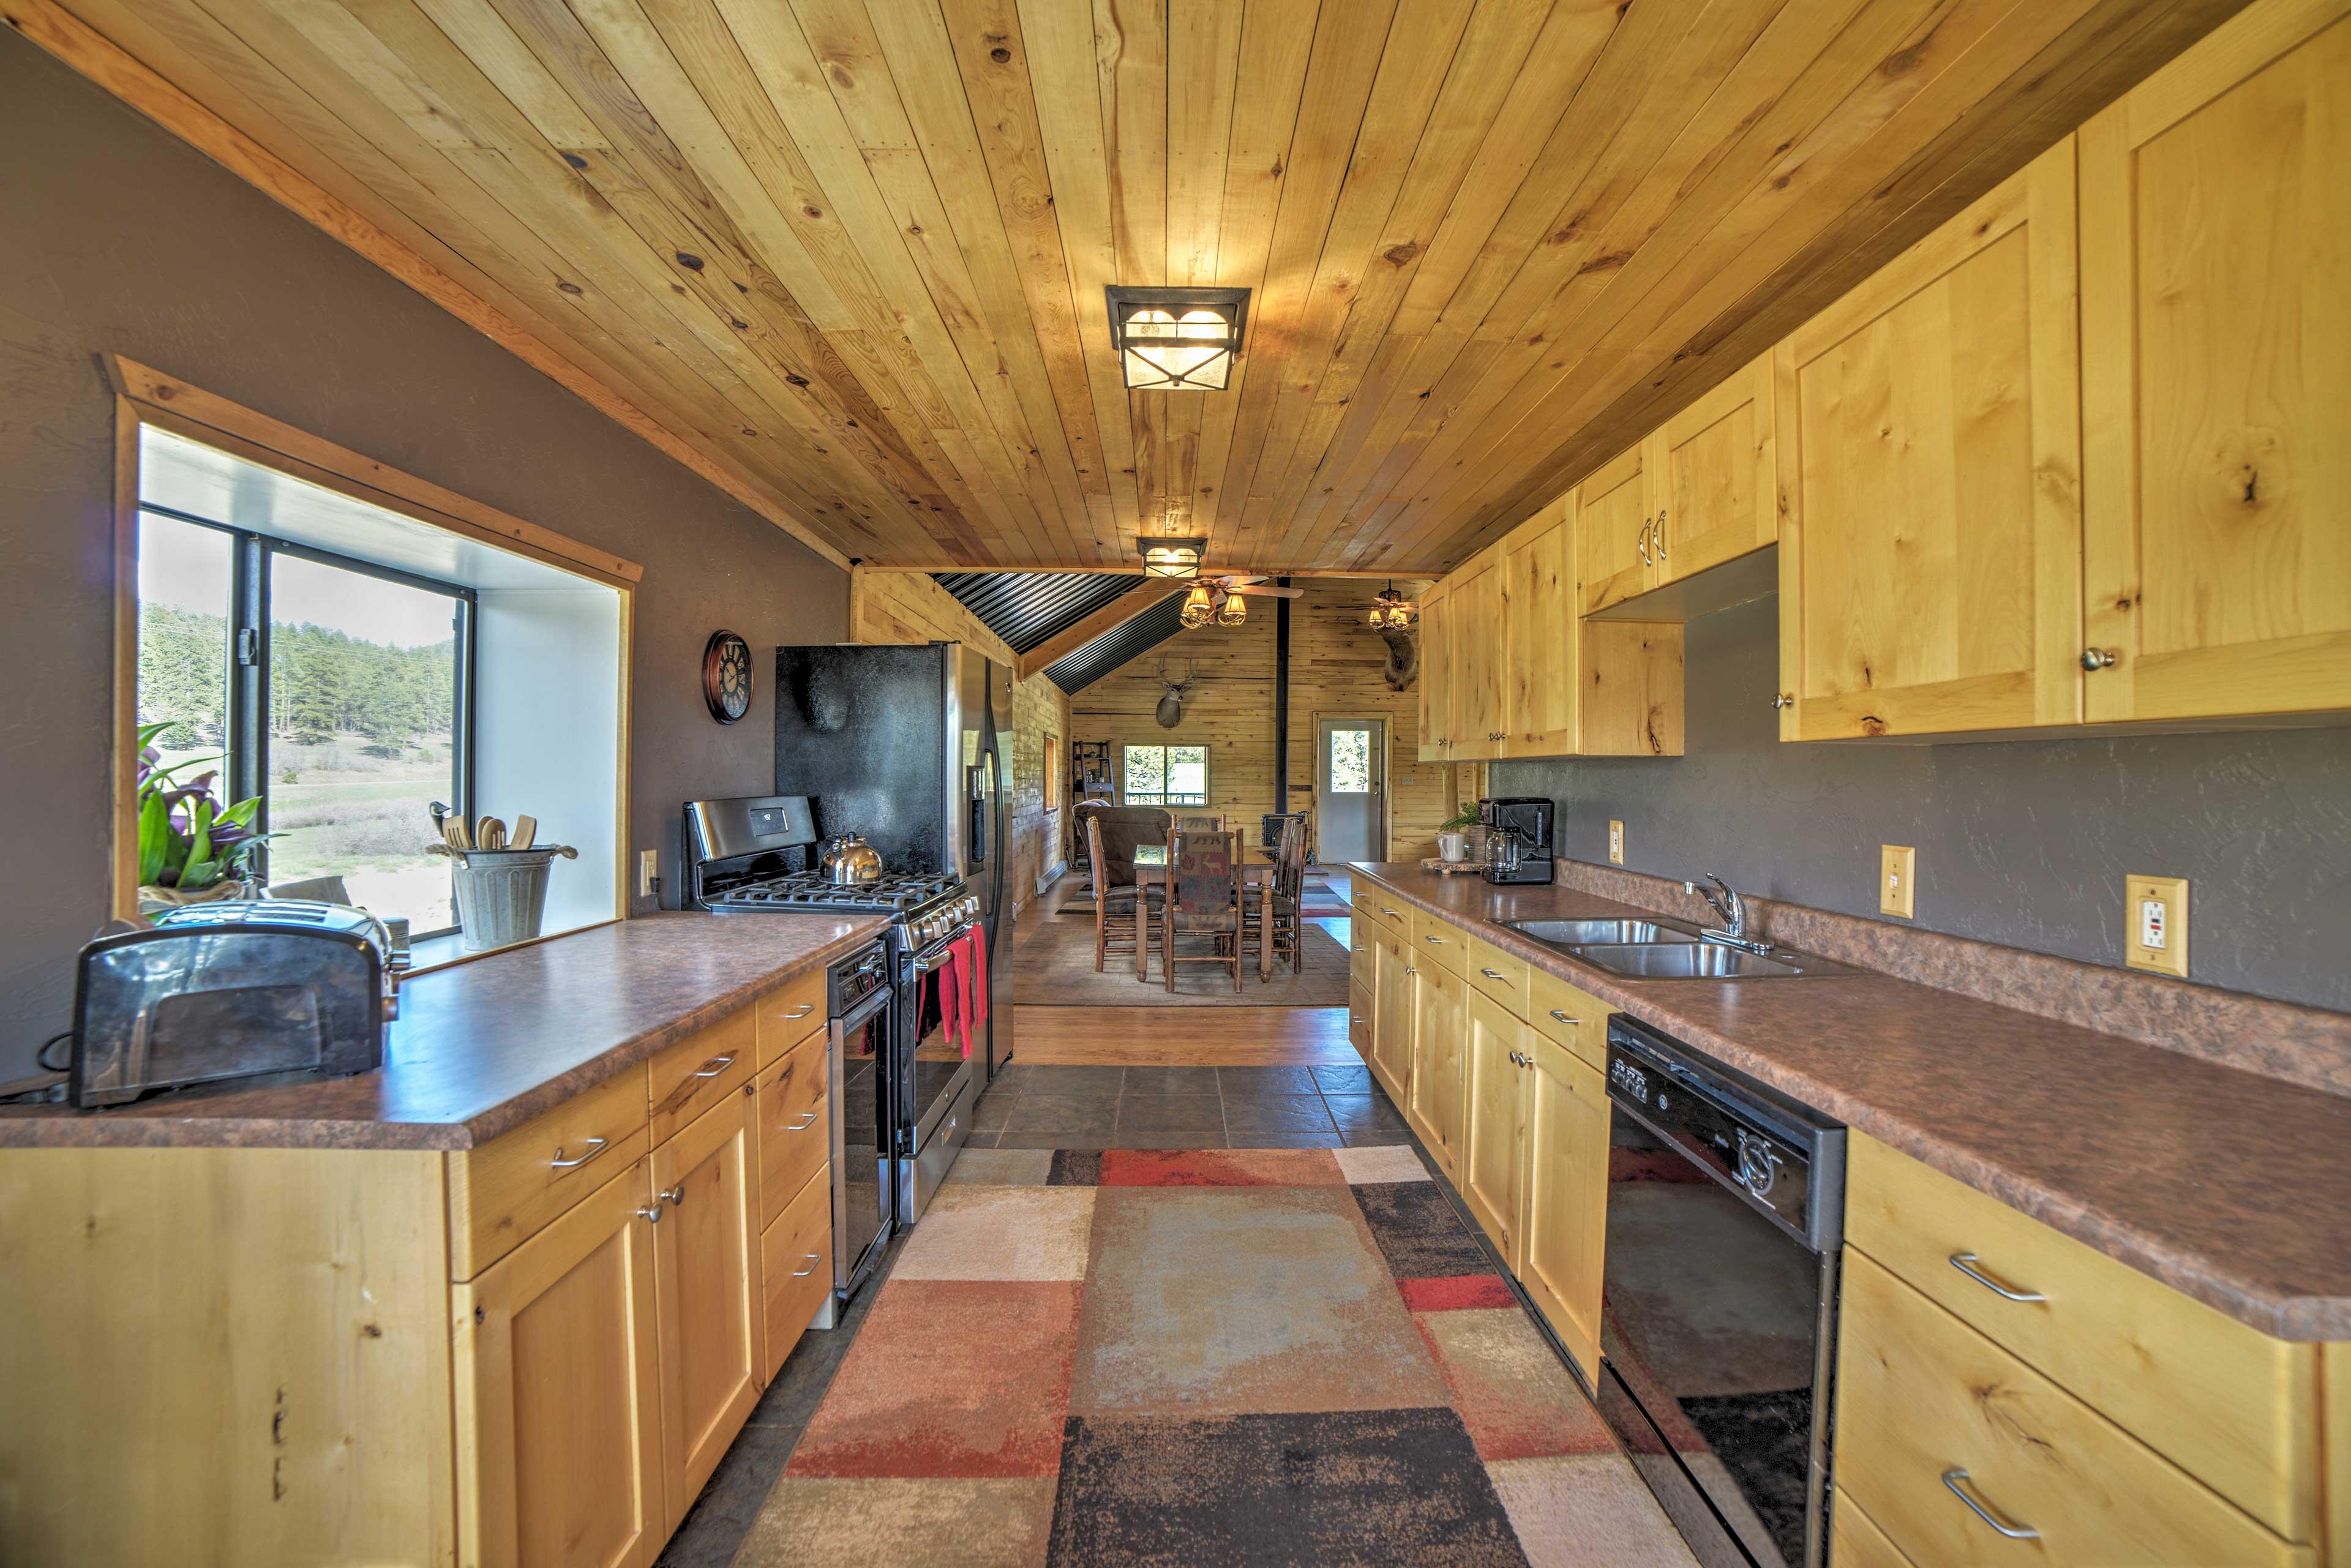 Full Kitchen | Dishwasher | Knotty-Pine Accents